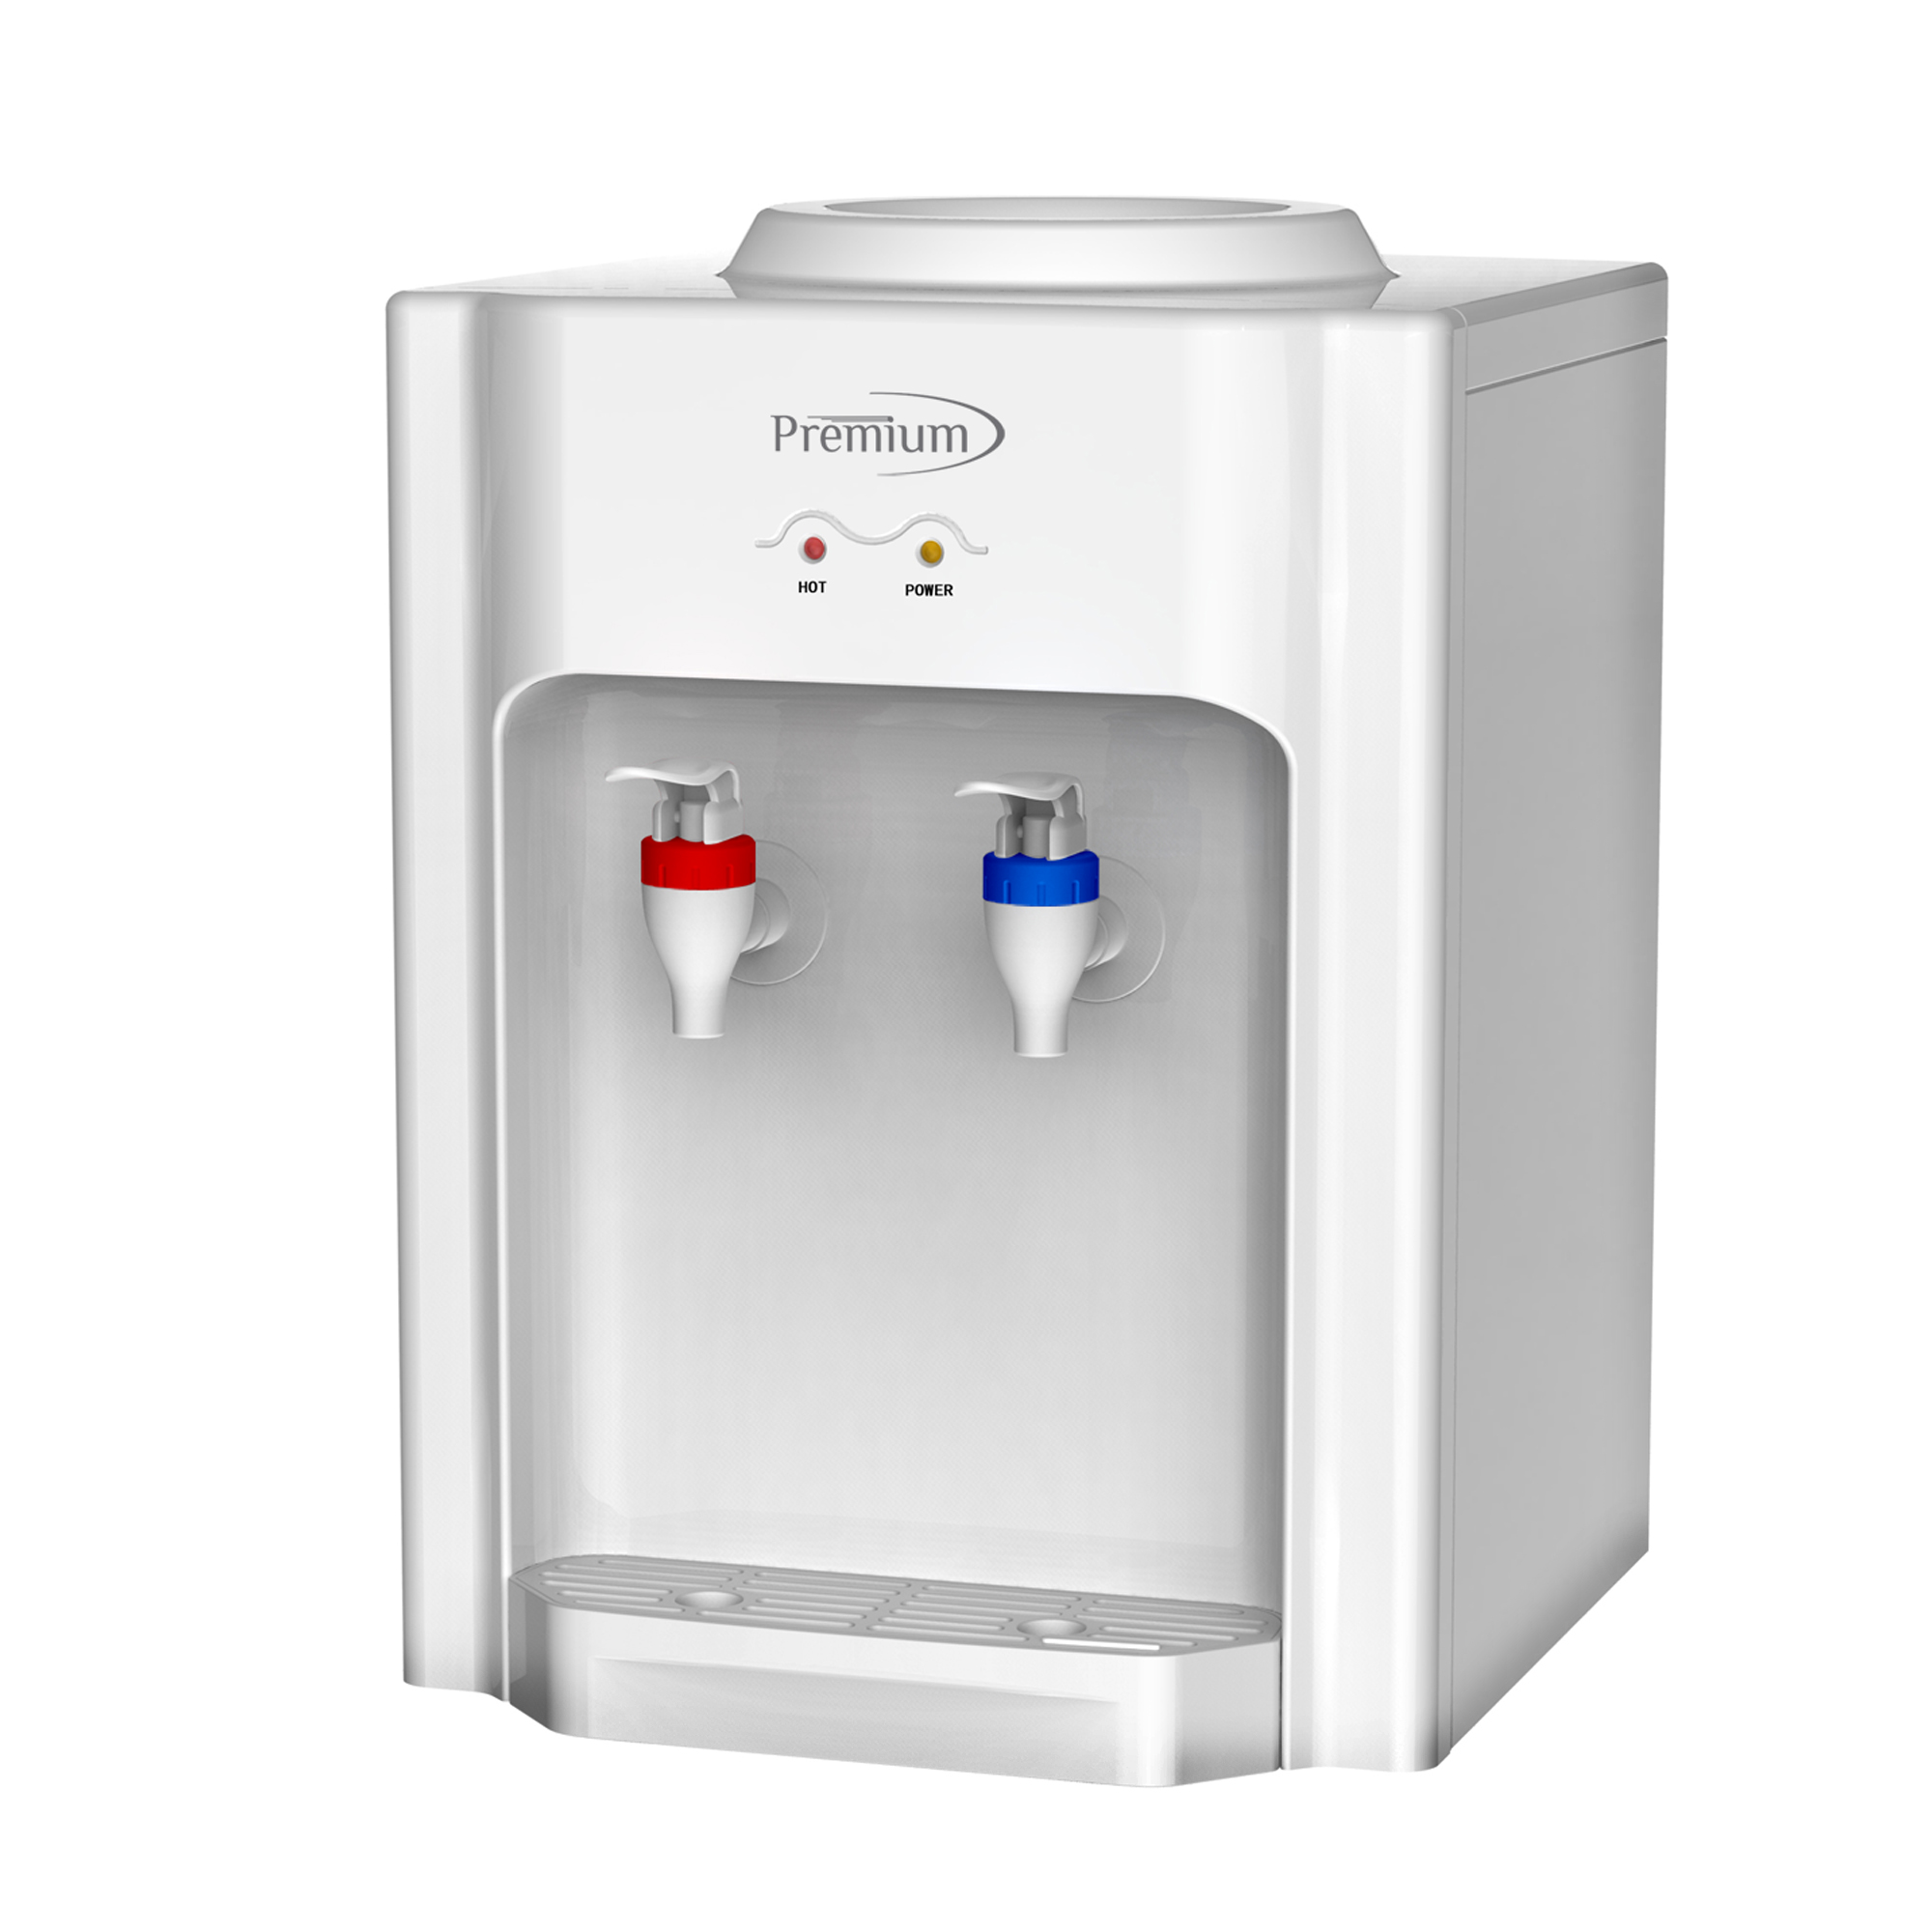 Premium Appliances Table Water Dispenser